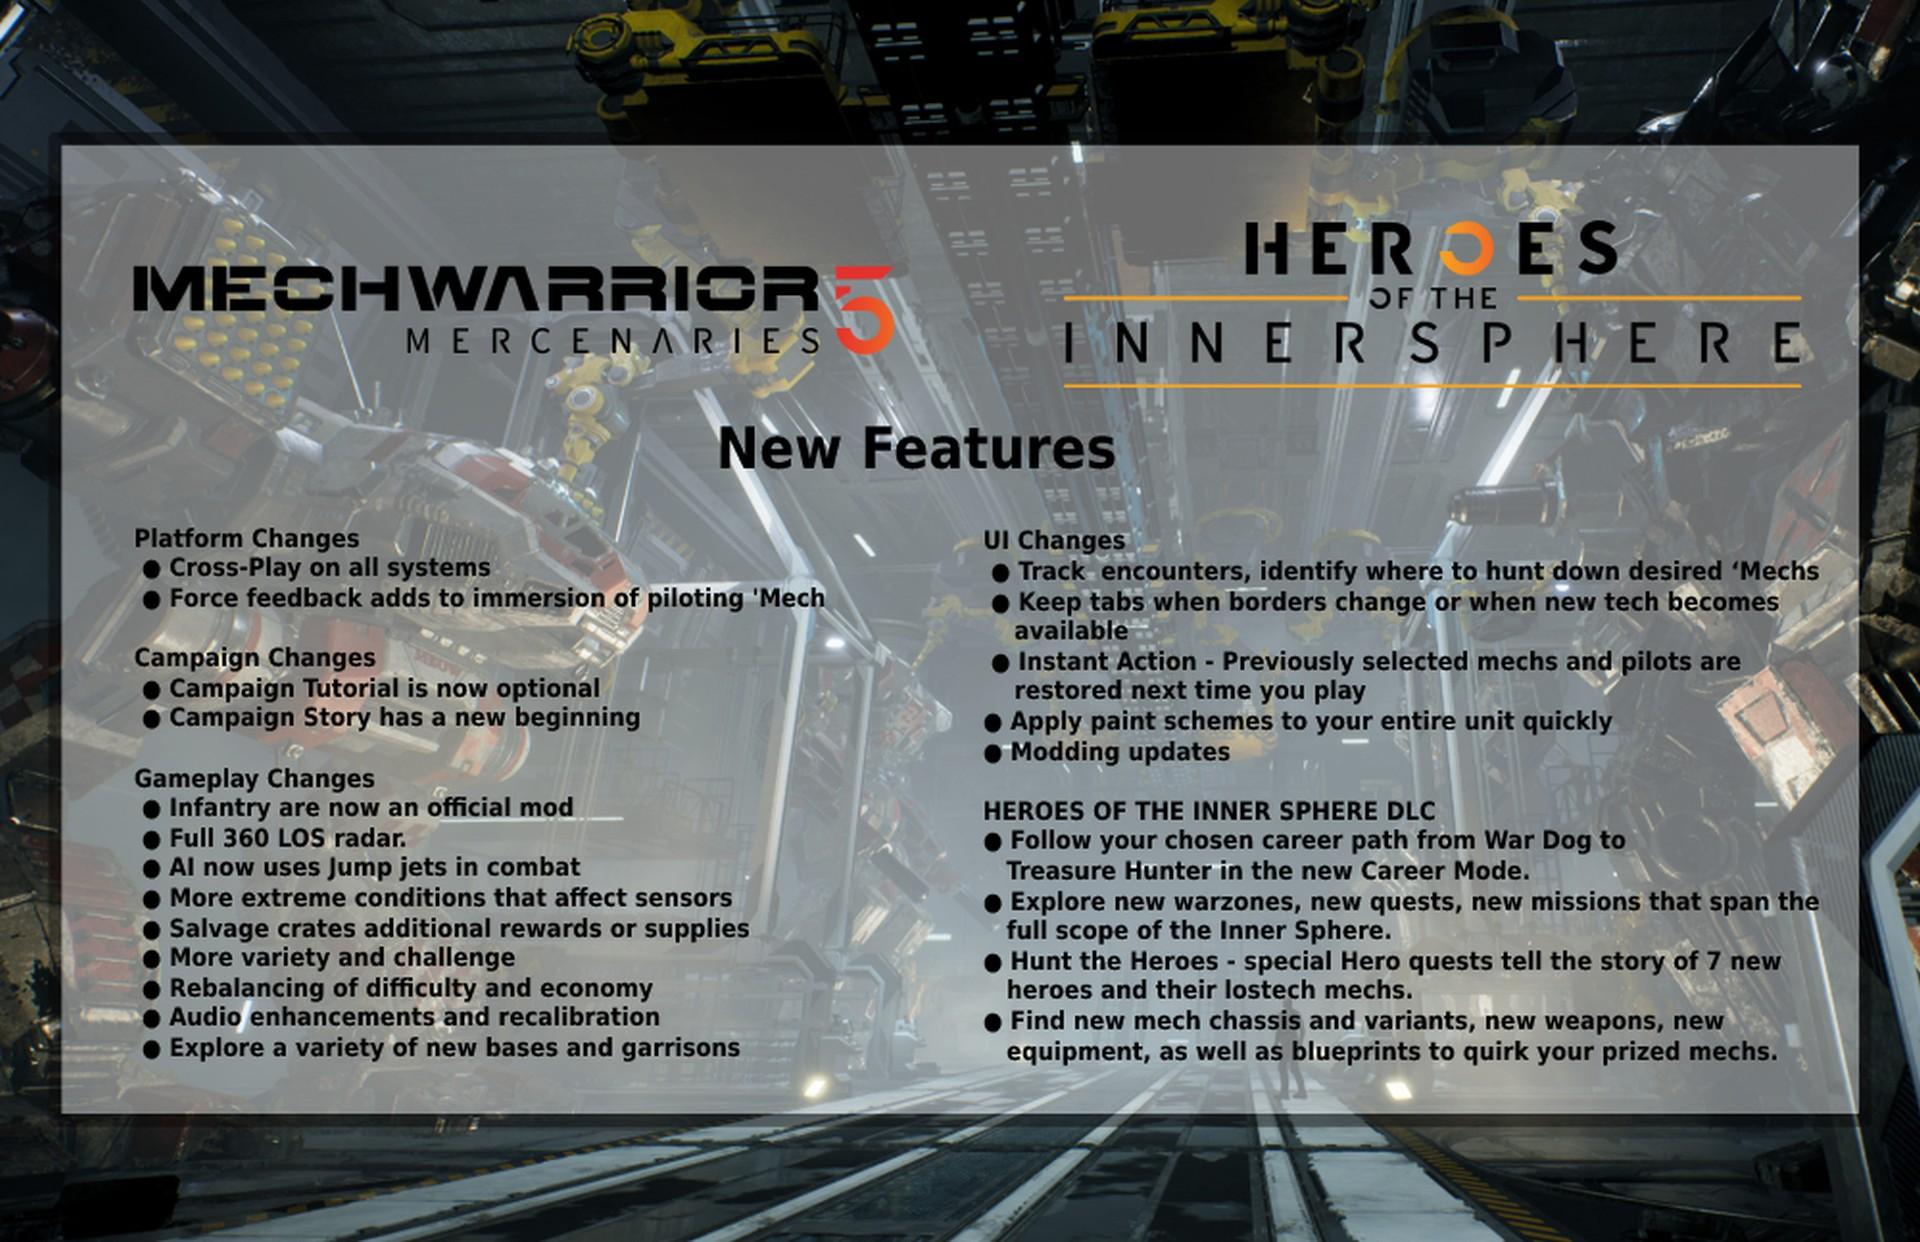 All about MechWarrior 5 Mercenaries Crossplay